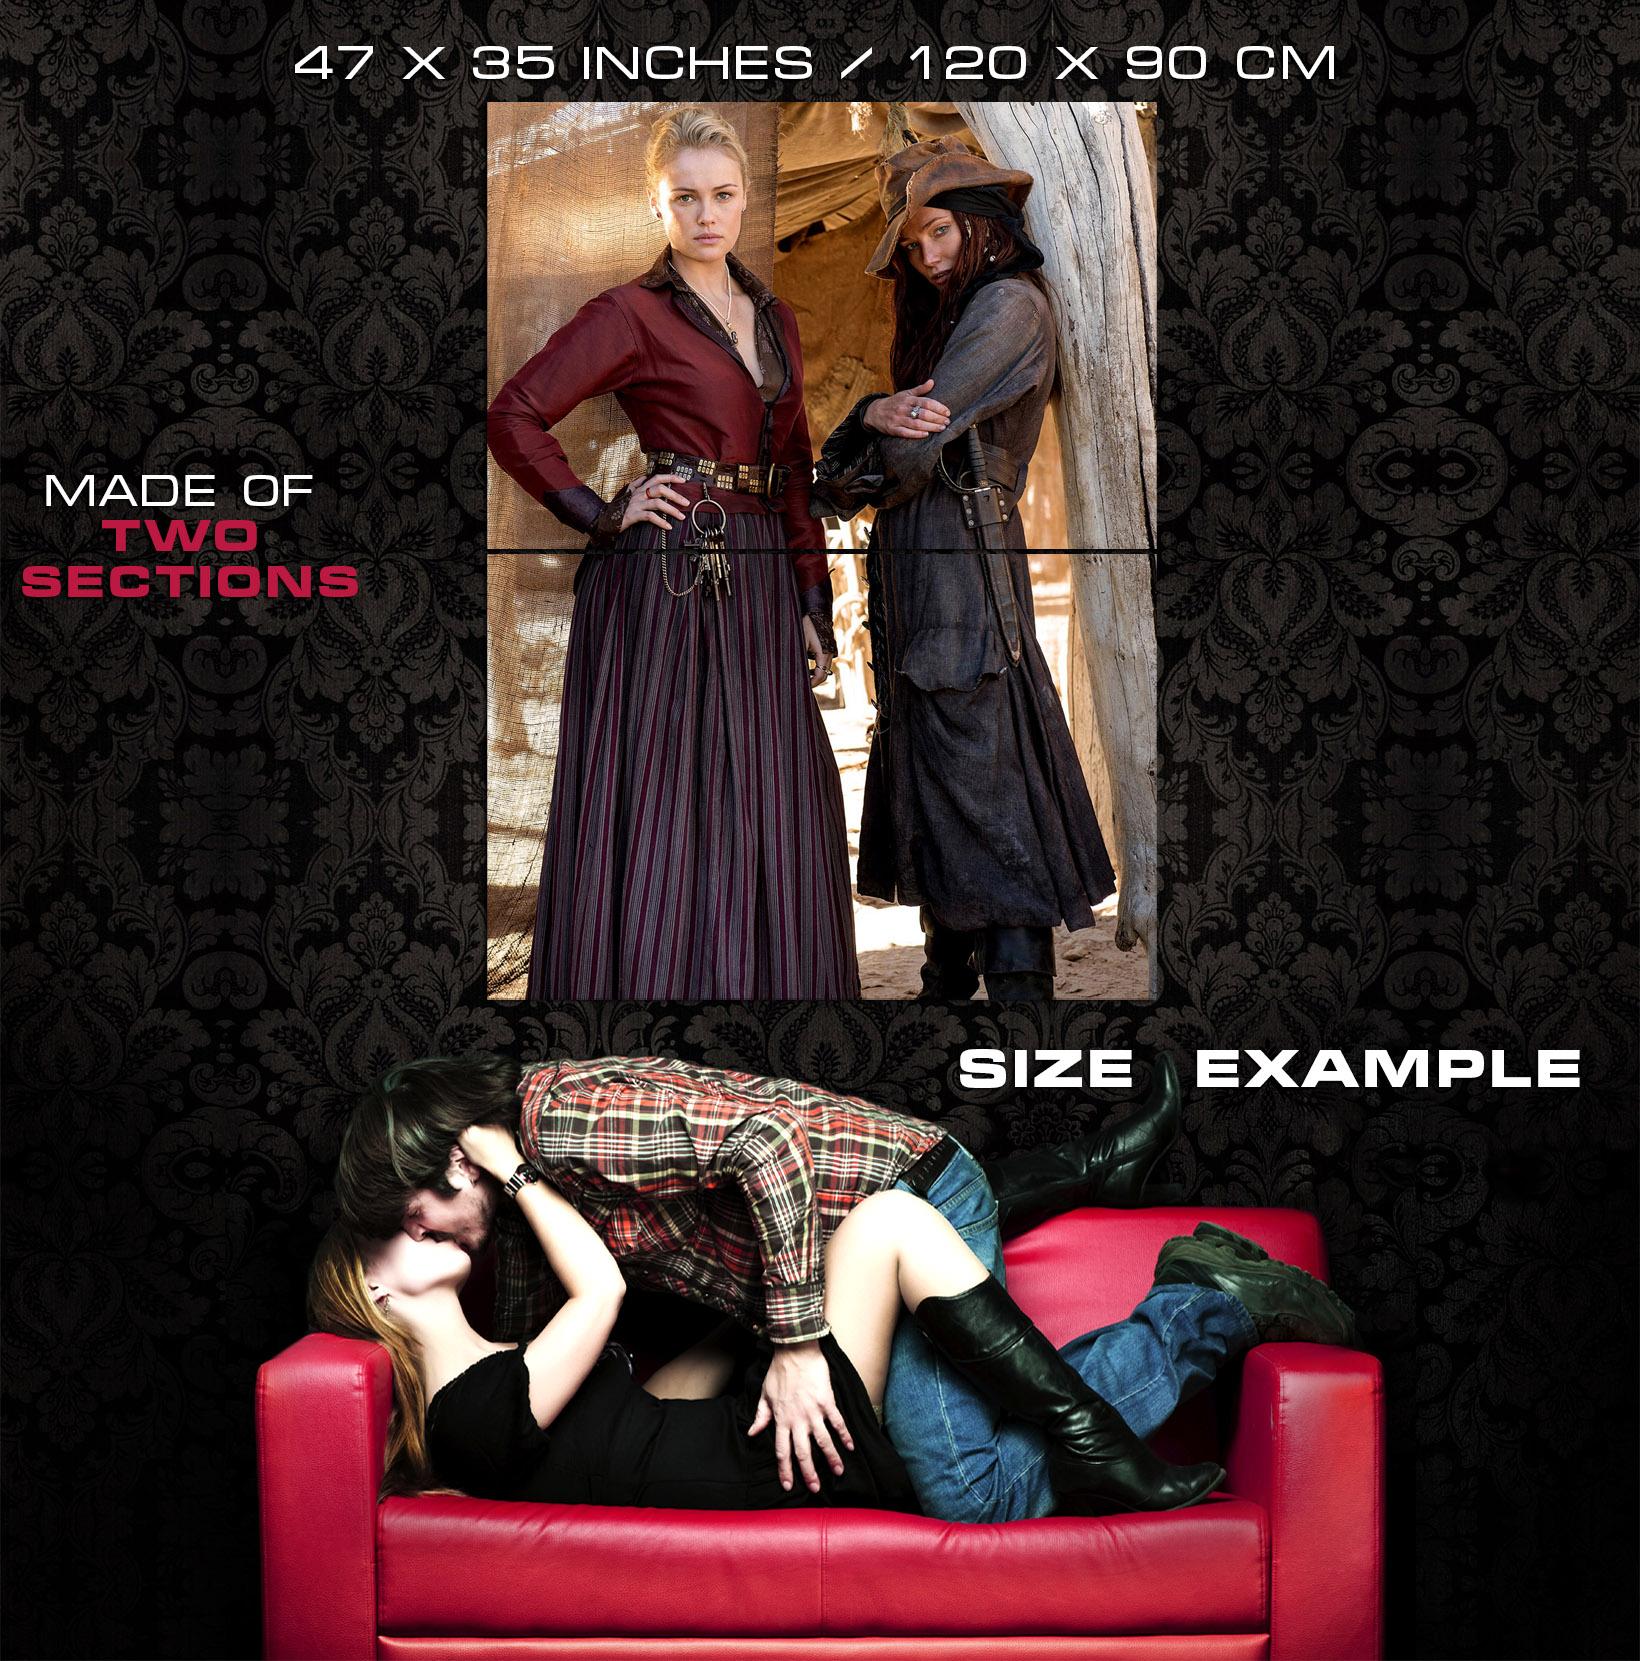 black sails clara paget hannah new tv series huge giant print poster